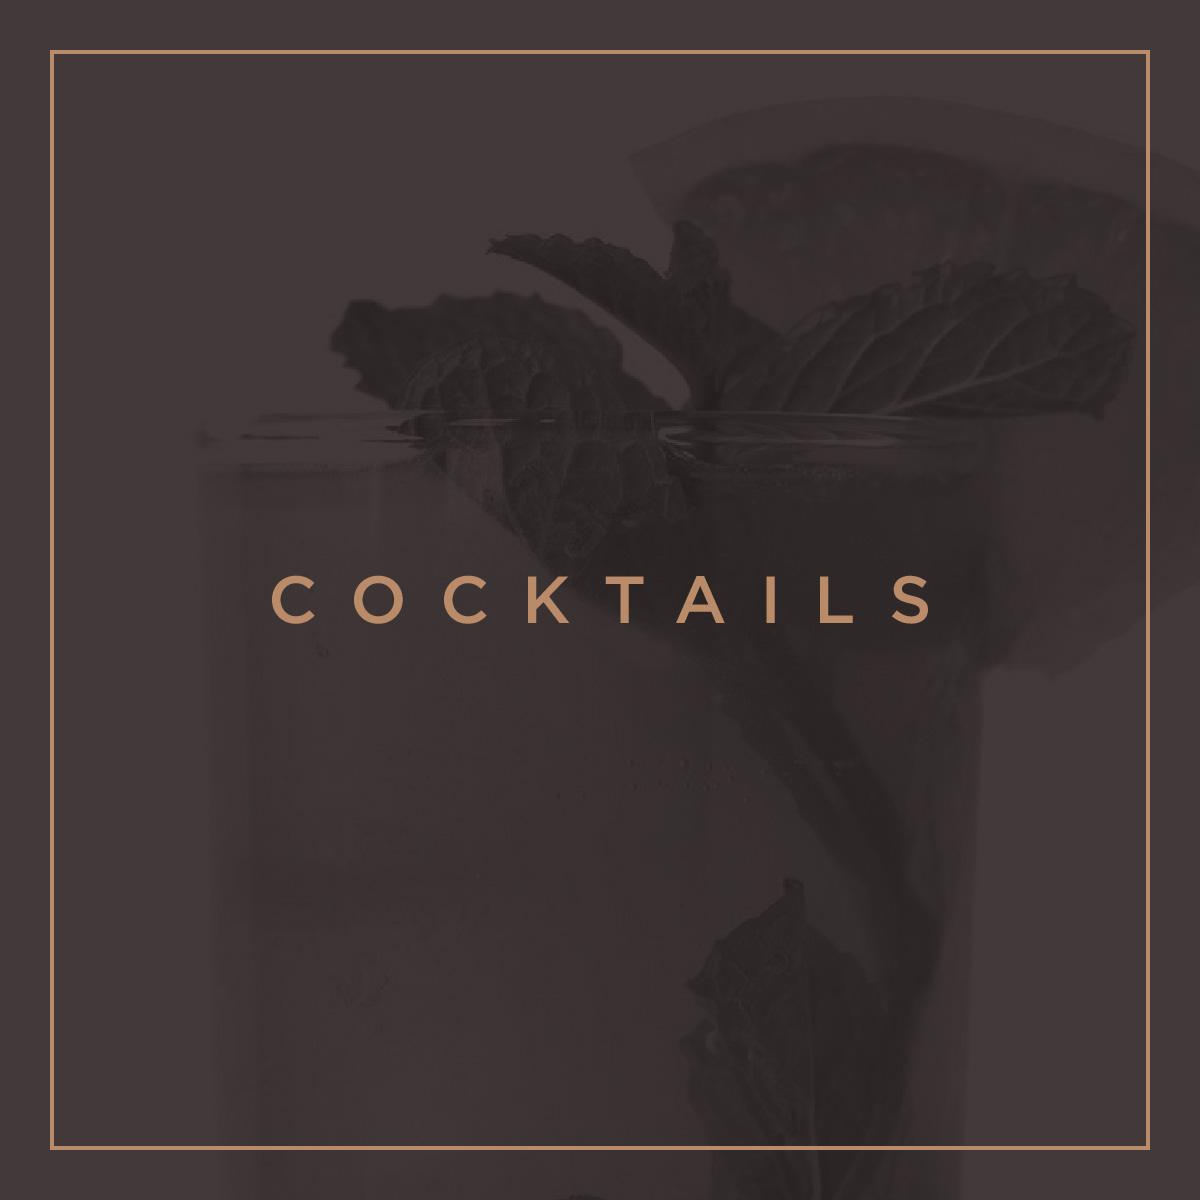 sento bene - cocktails